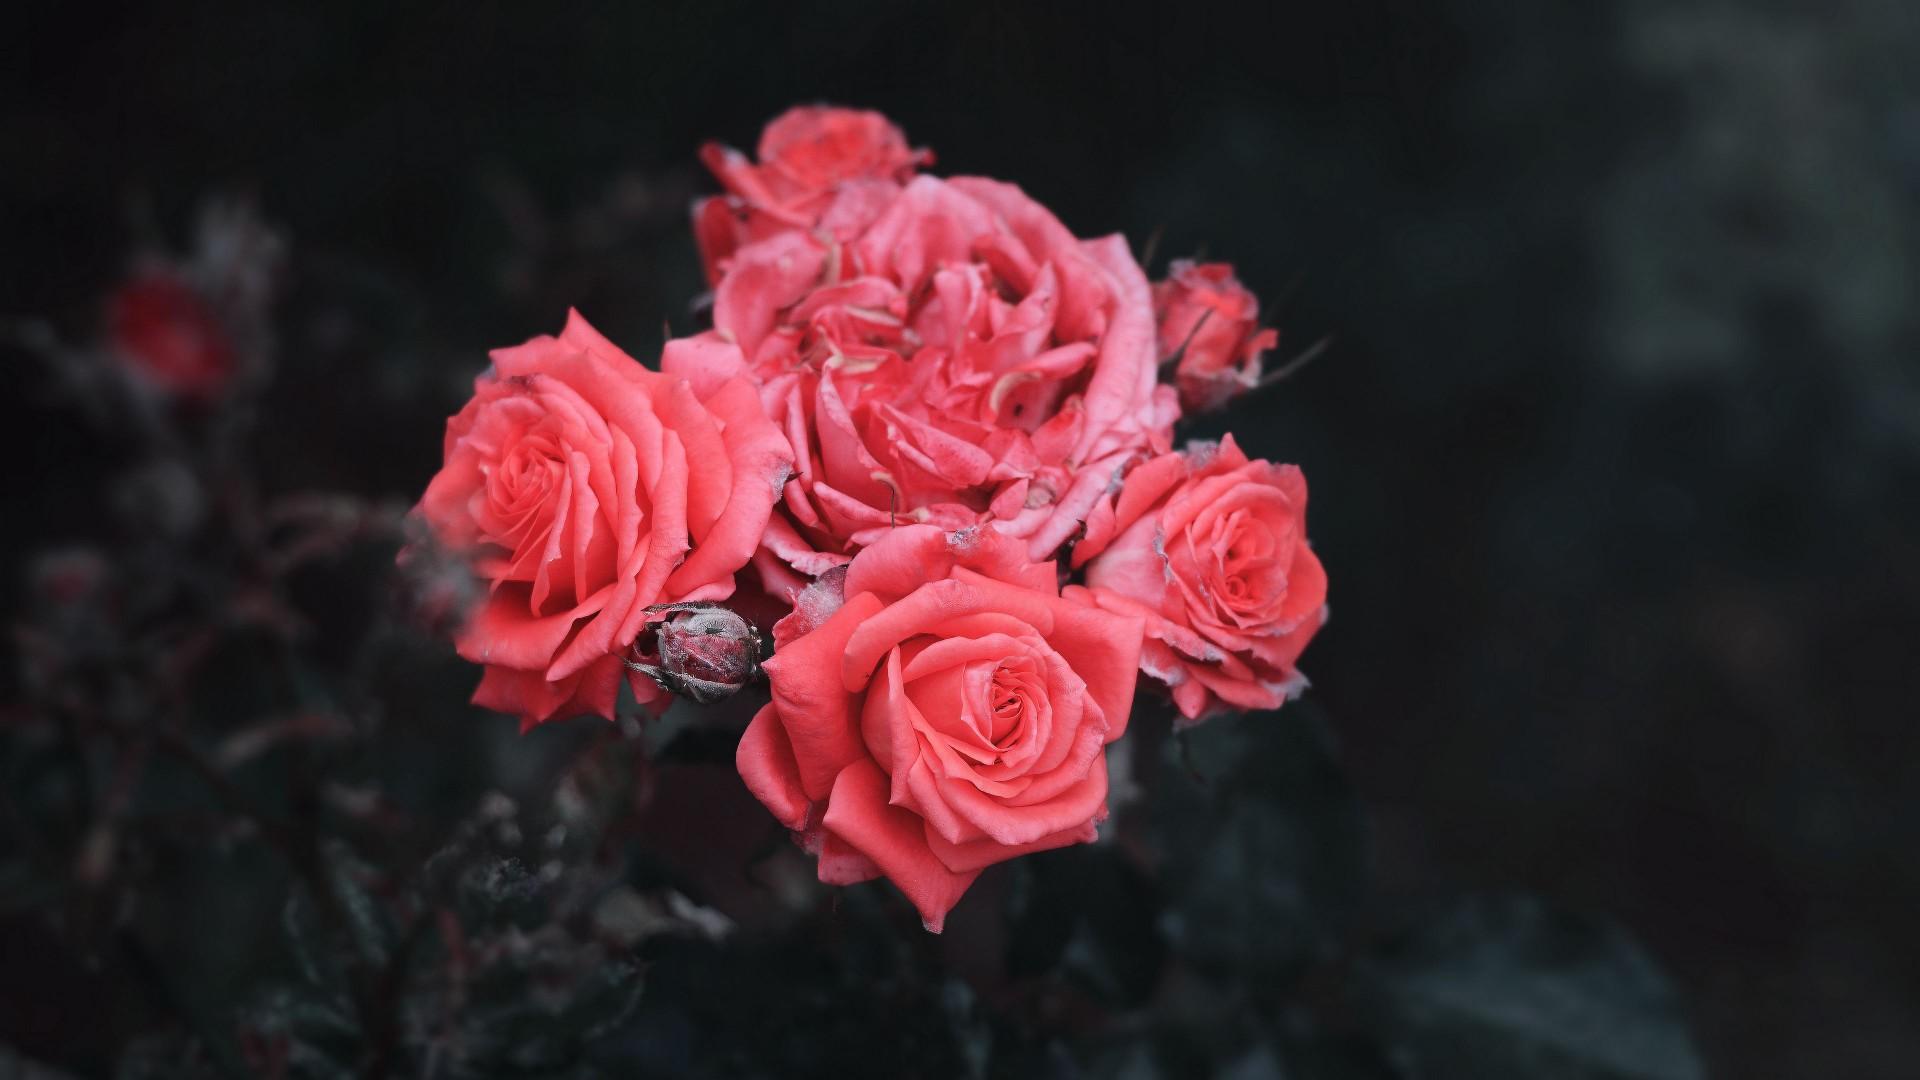 Pink roses bush buds in black background 4k HD flowers Wallpaper